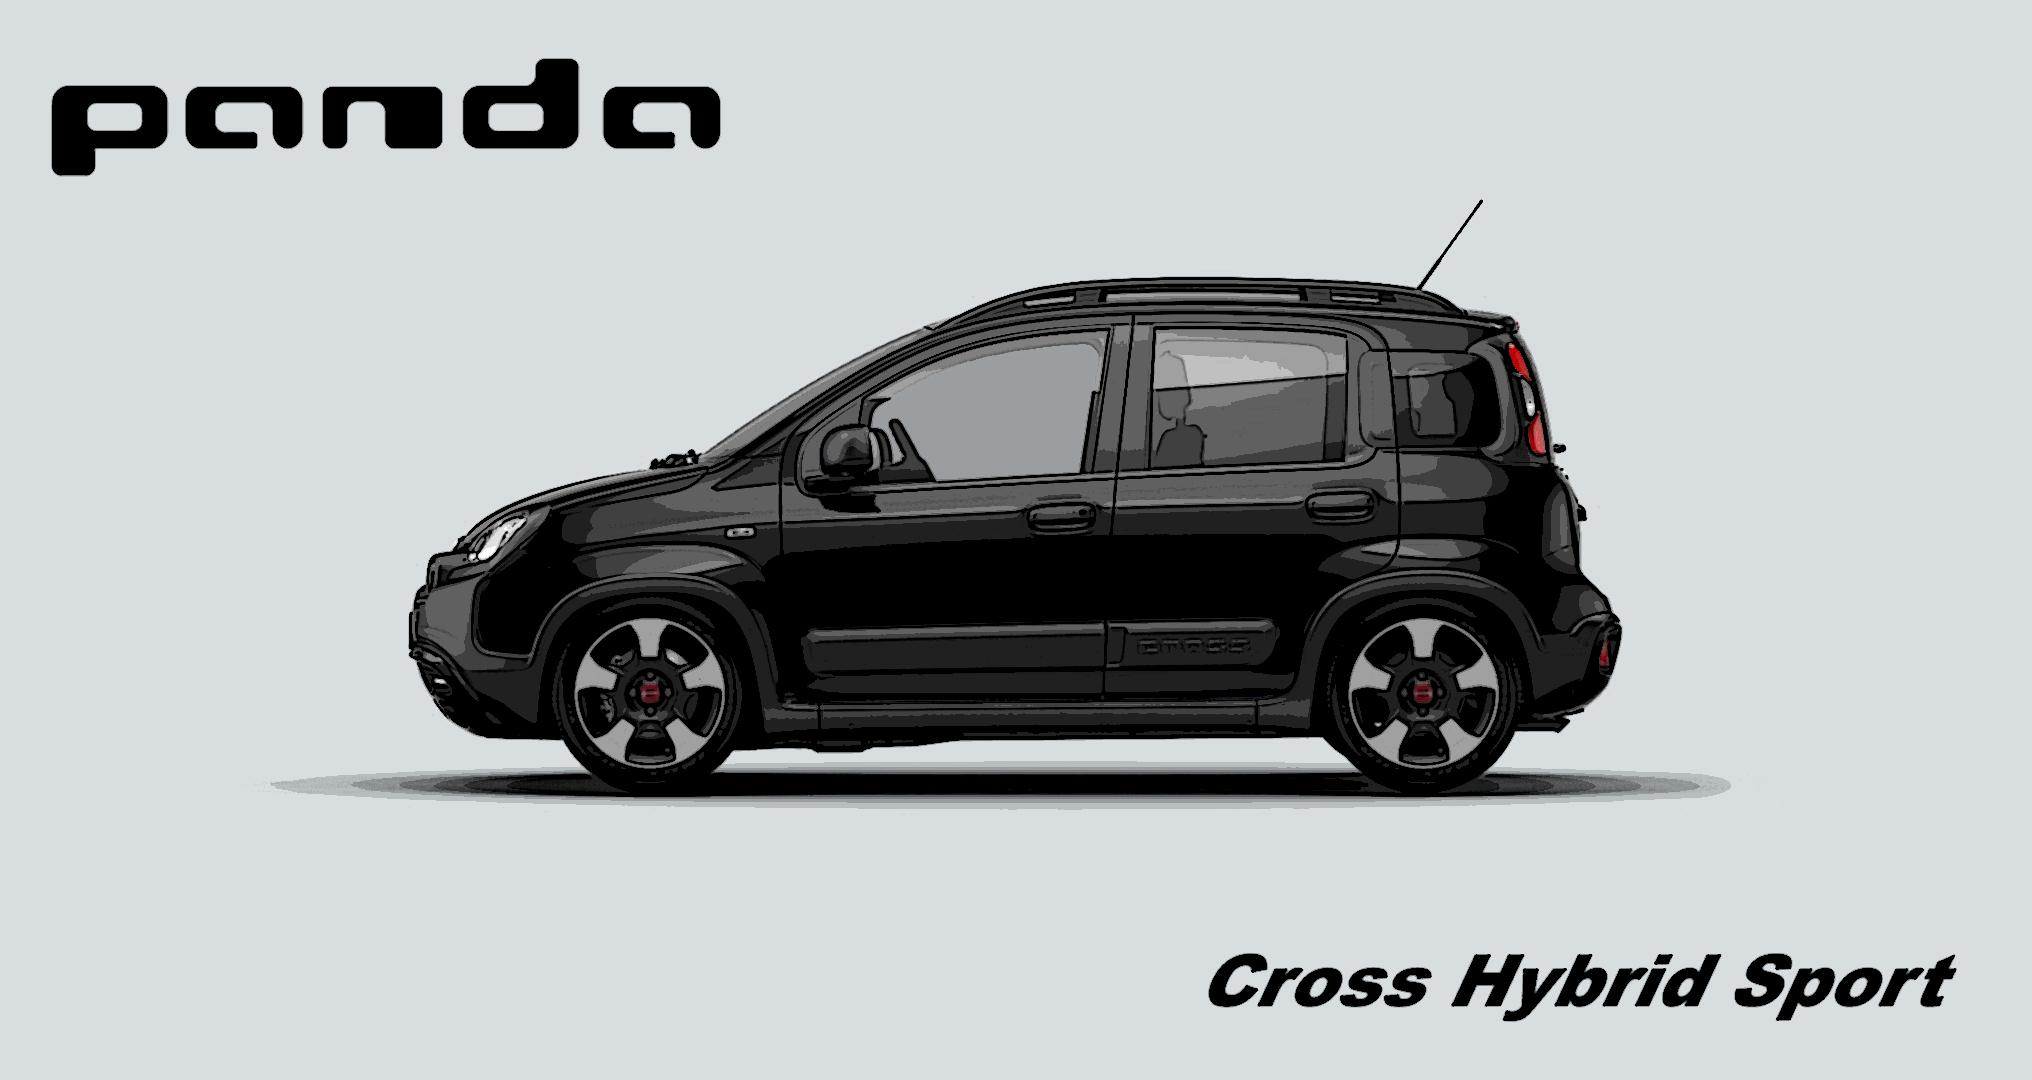 Click image for larger version  Name:FIAT Panda Cross Hybrid Sport.jpeg Views:39 Size:305.0 KB ID:209254